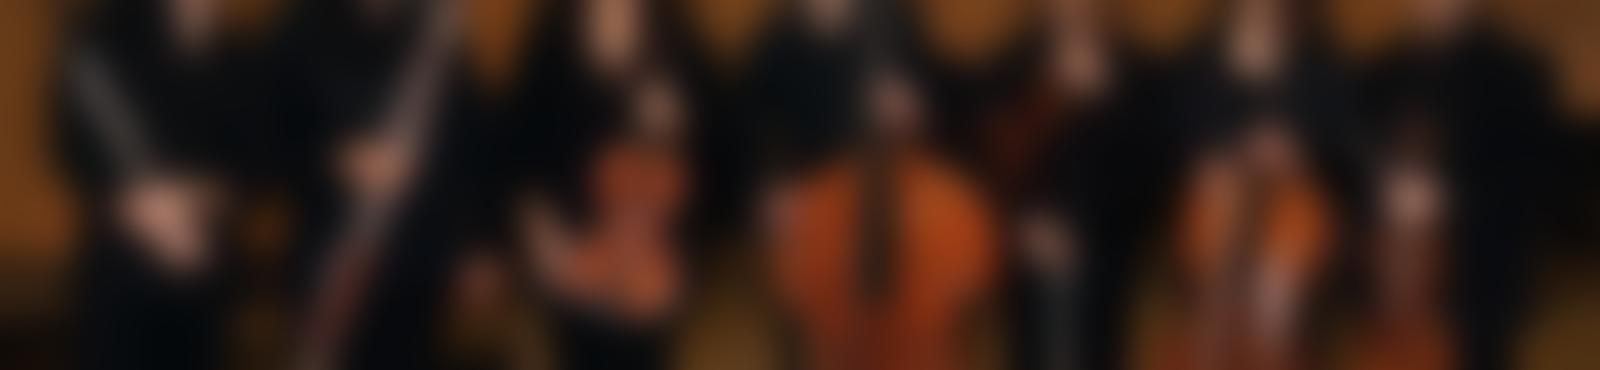 Blurred 07a3fd3a 25d8 40ac bf63 1a8907aaccf3